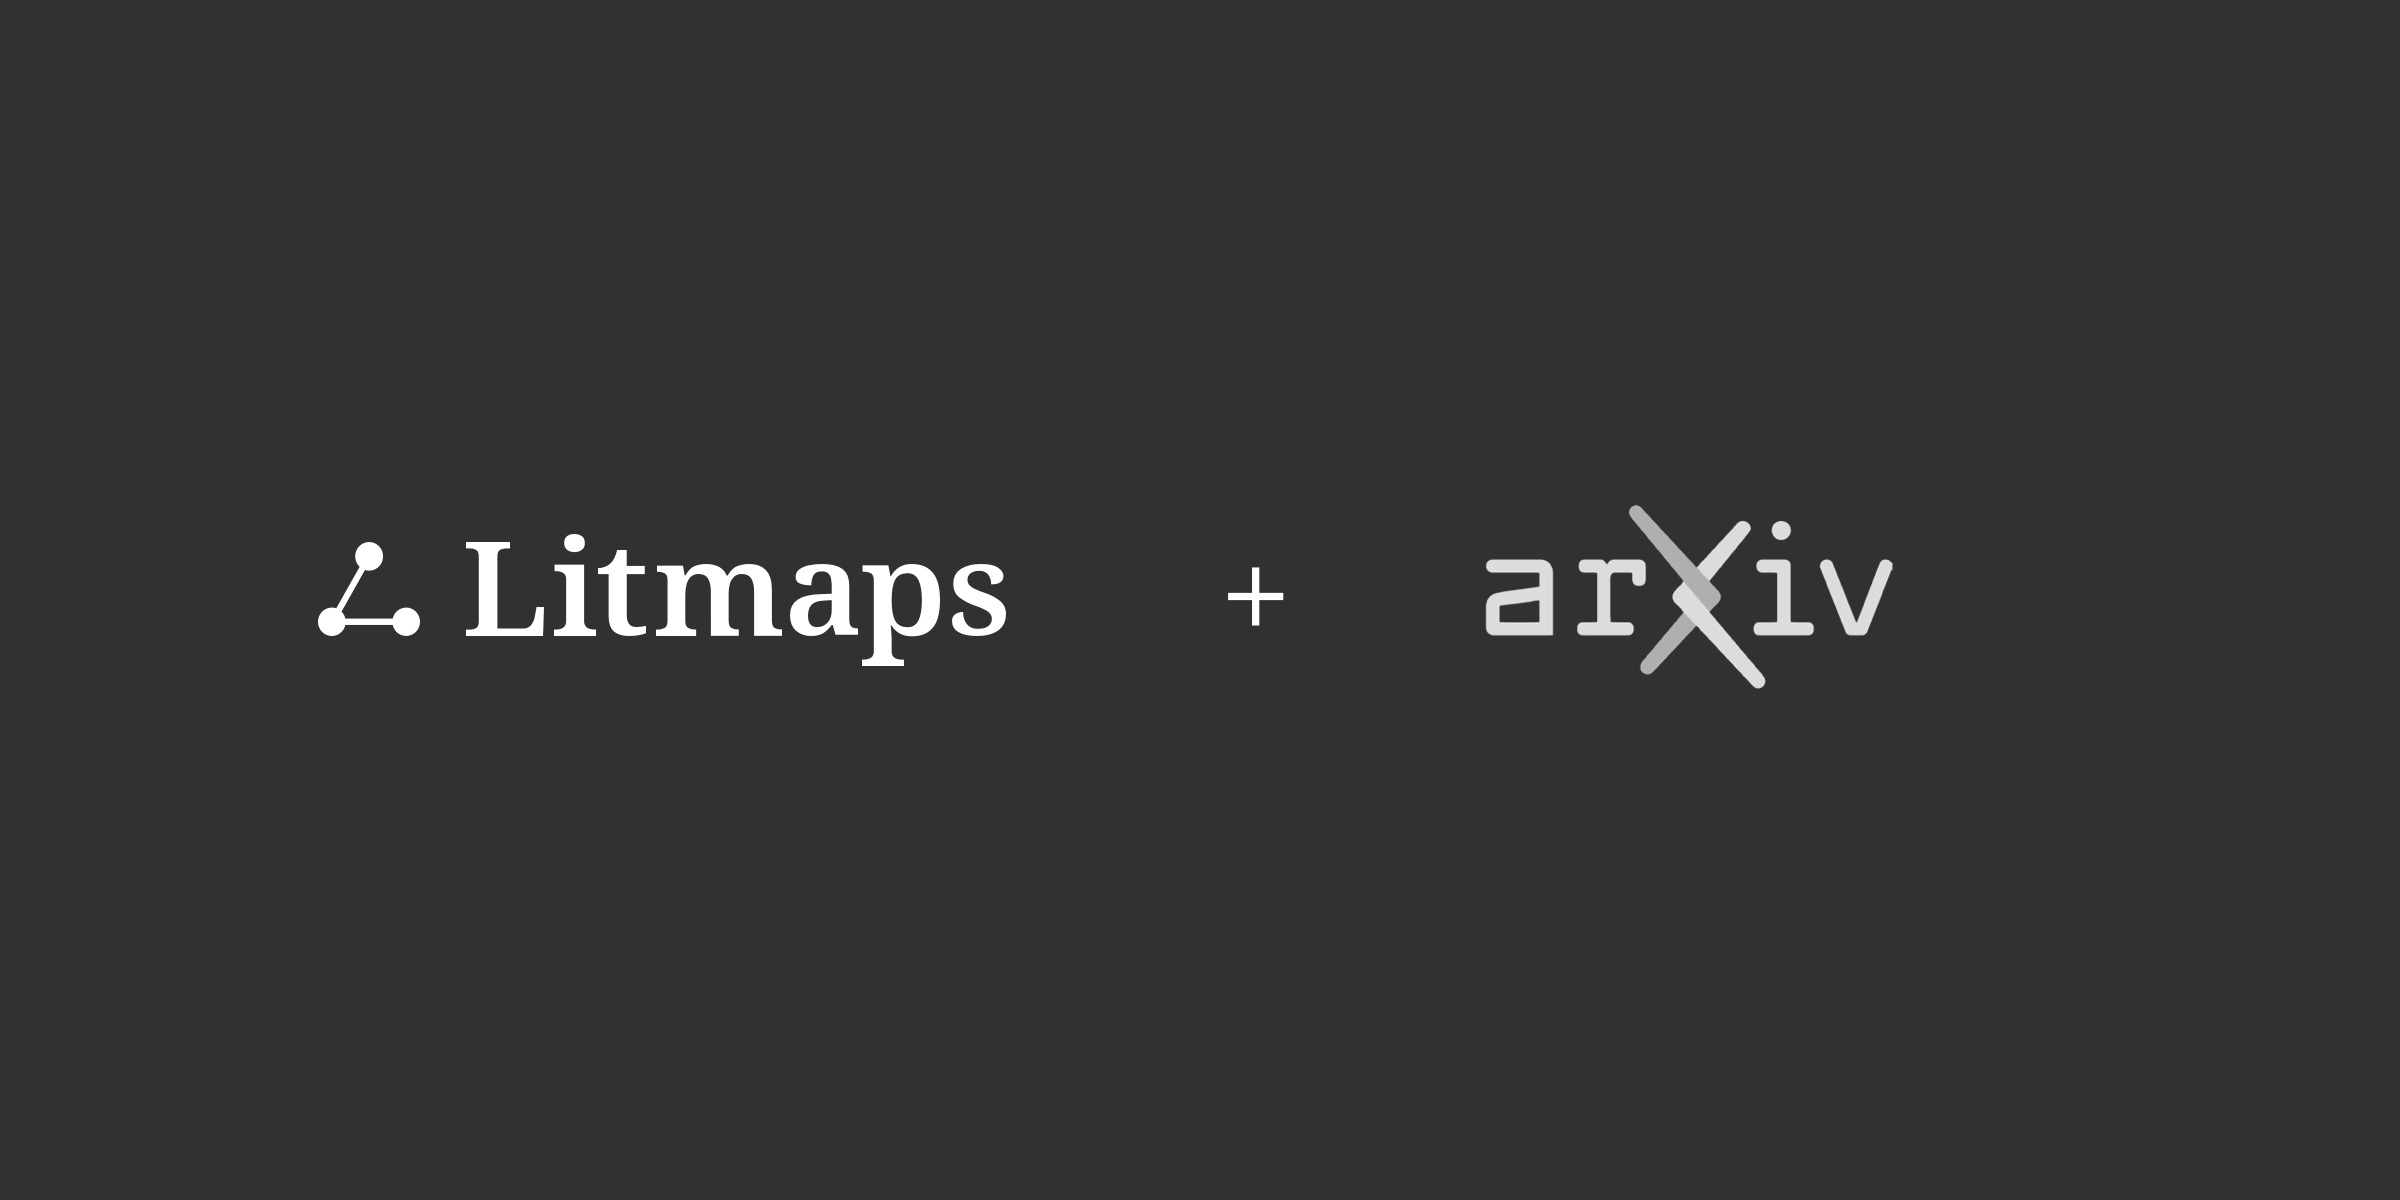 Litmaps + arXiv